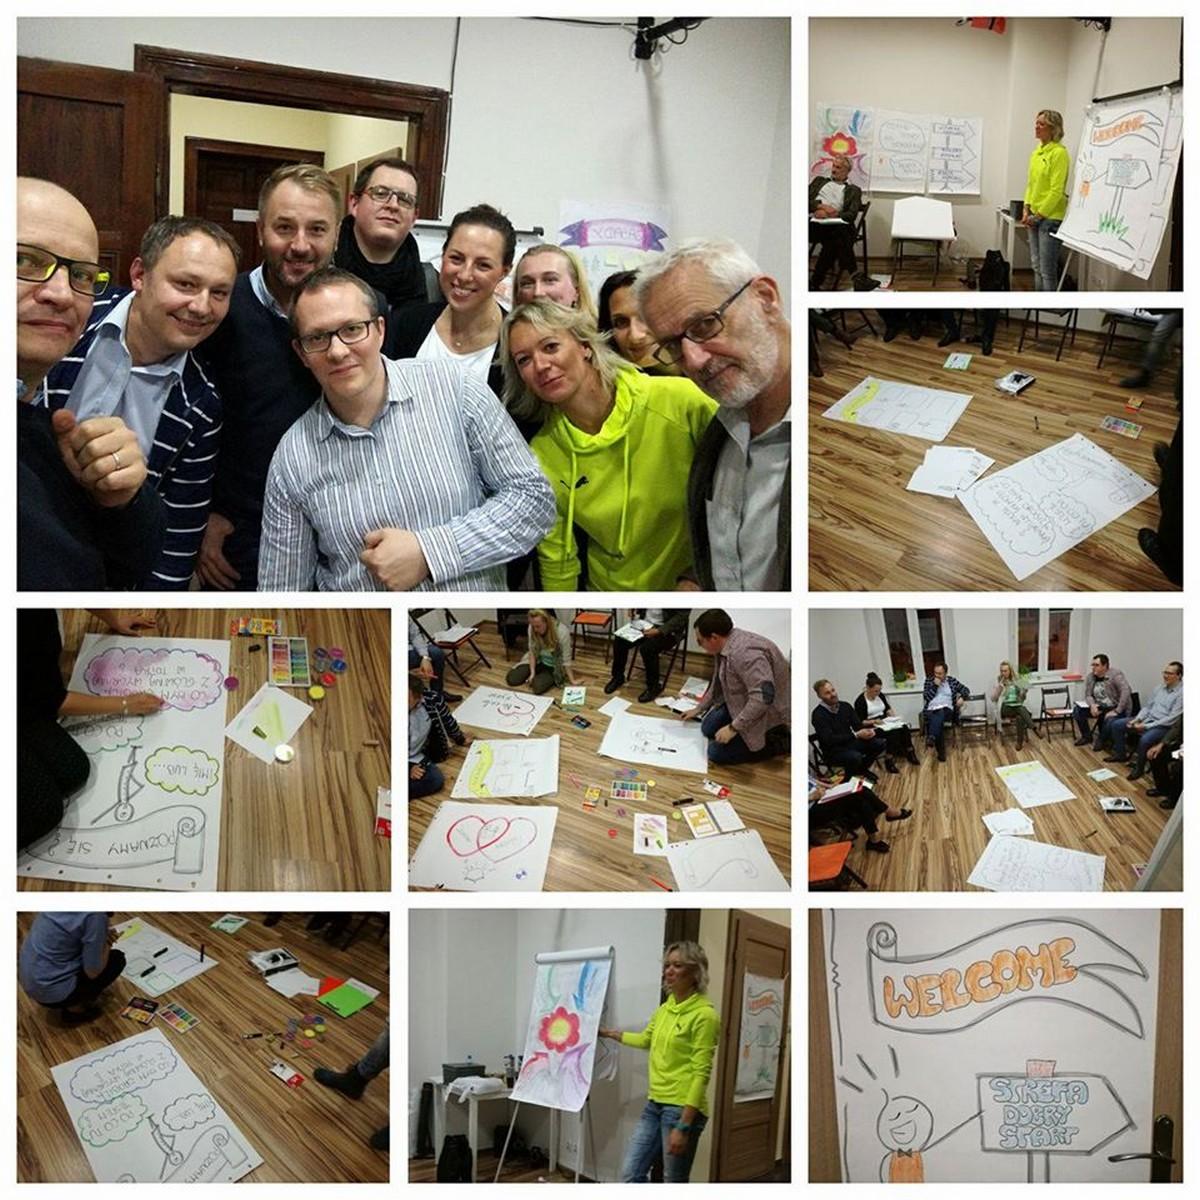 official_eleganse_strona_szkolenia_marta_debowiec_3_076